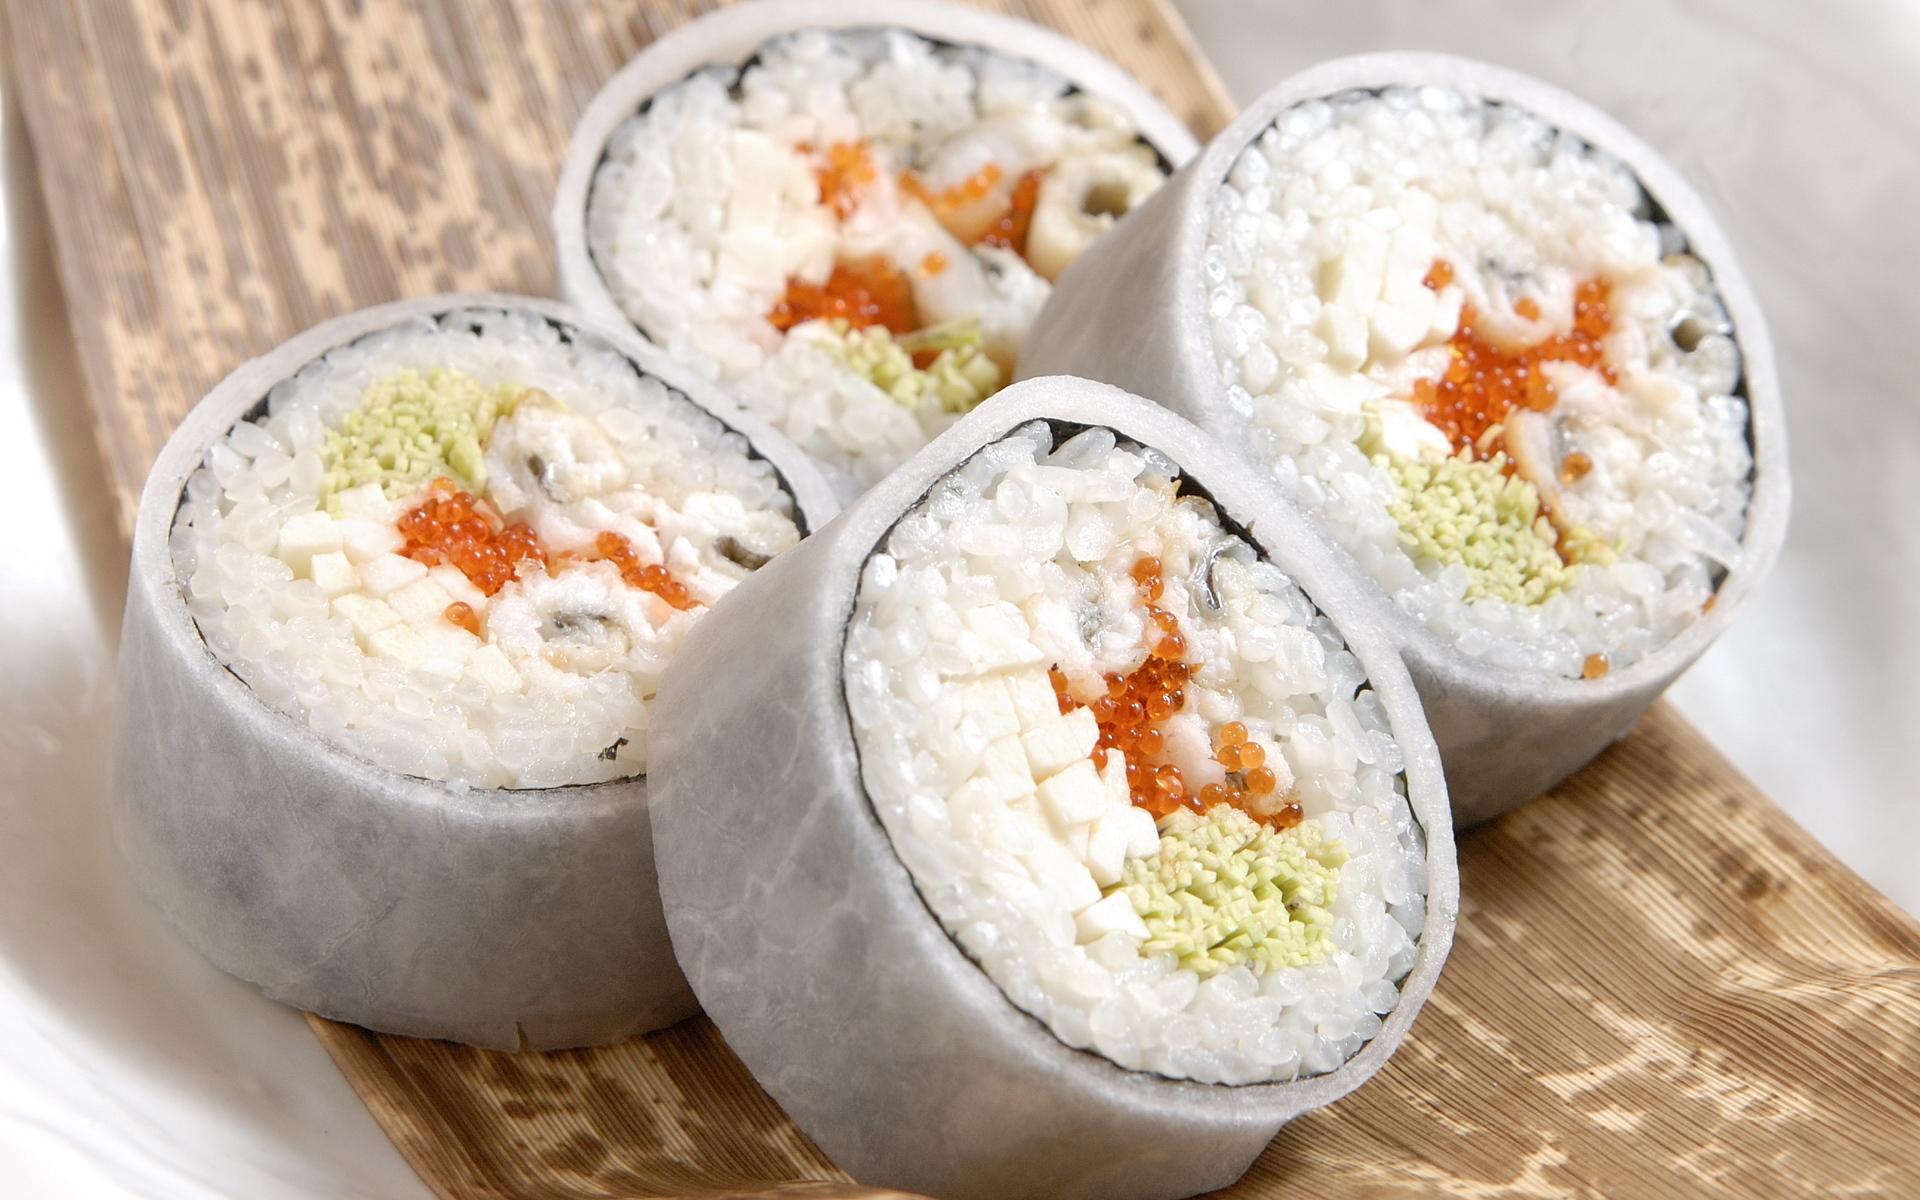 Скачать обои макро, еда, рыба, рис, икра, food, 1920x1200, macro, sushi,  суши, fish, fish eggs, роллы, rice, раздел еда в разрешении 1920x1200